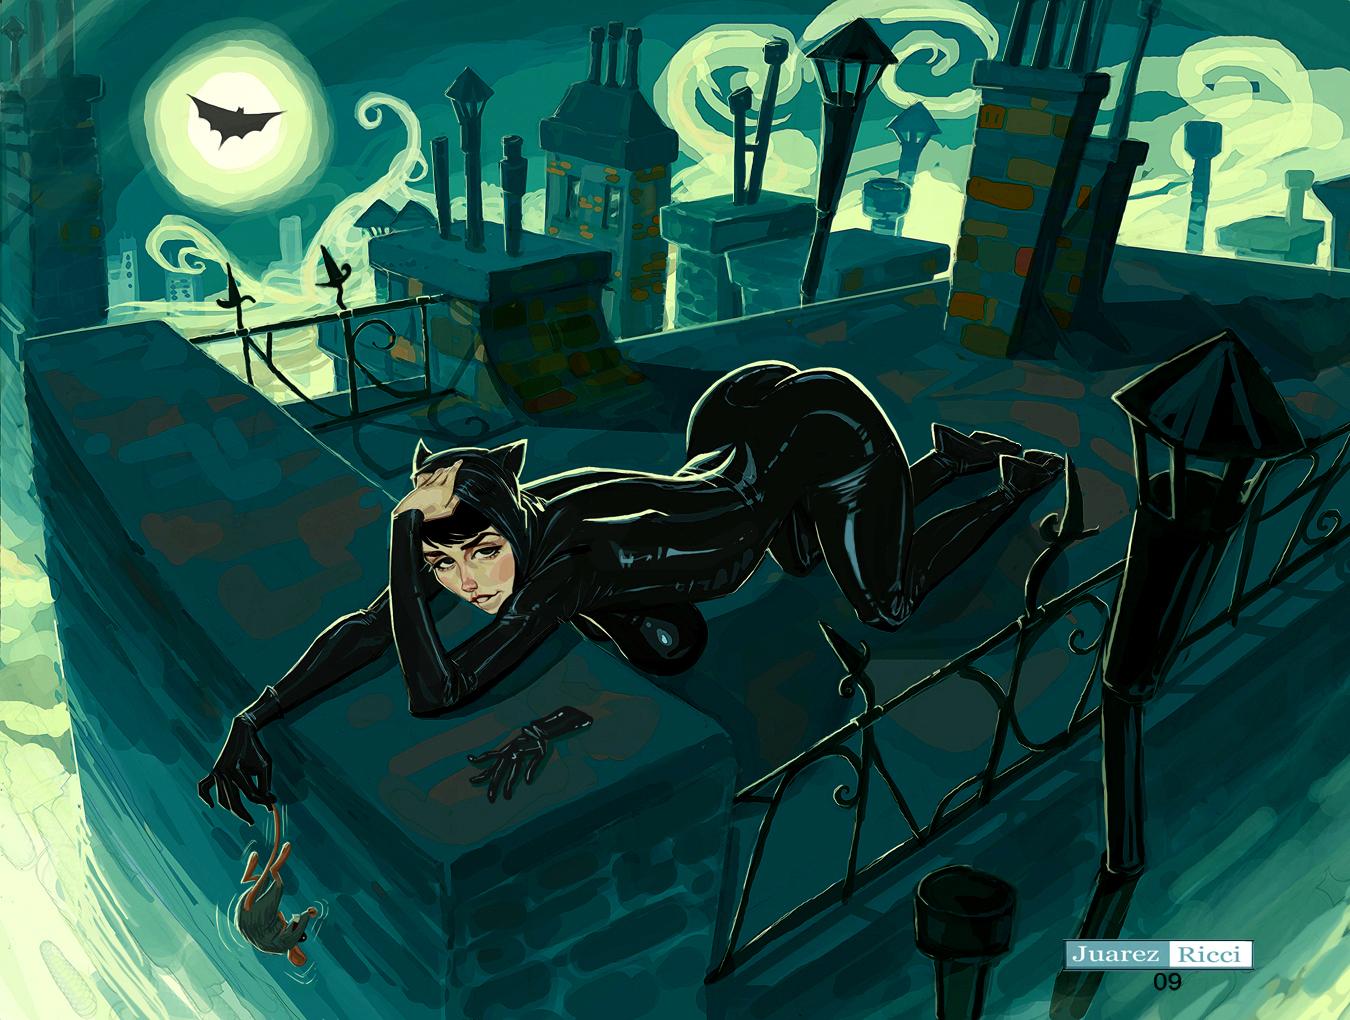 Catwoman by juarezricci